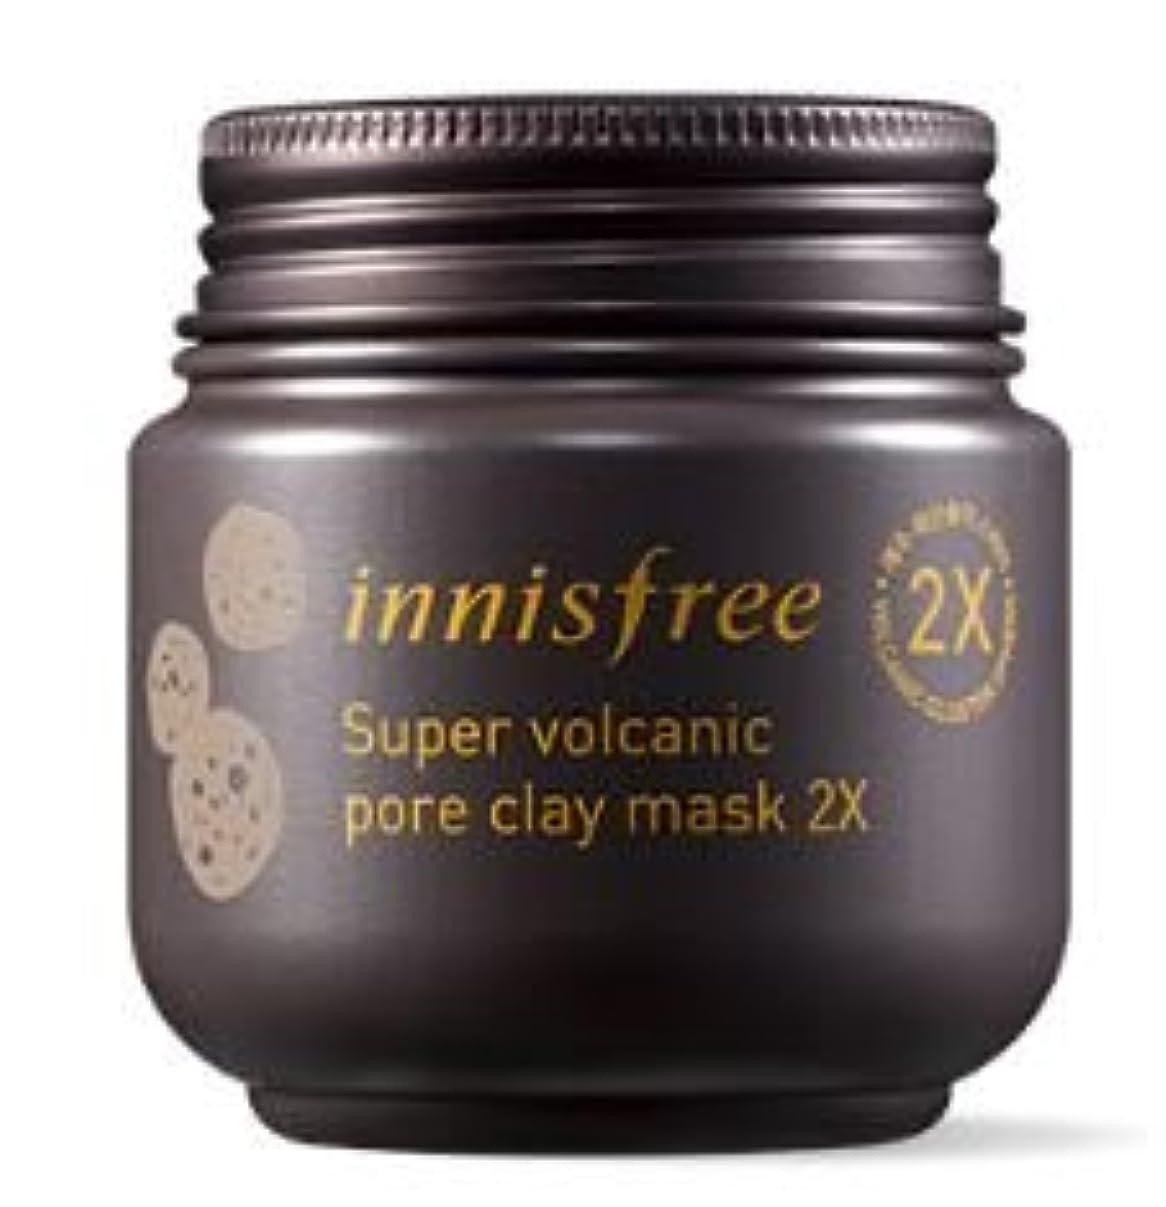 ★NEW★[innisfree] Super Volcanic Pore Clay Mask 2x 100ml [並行輸入品]